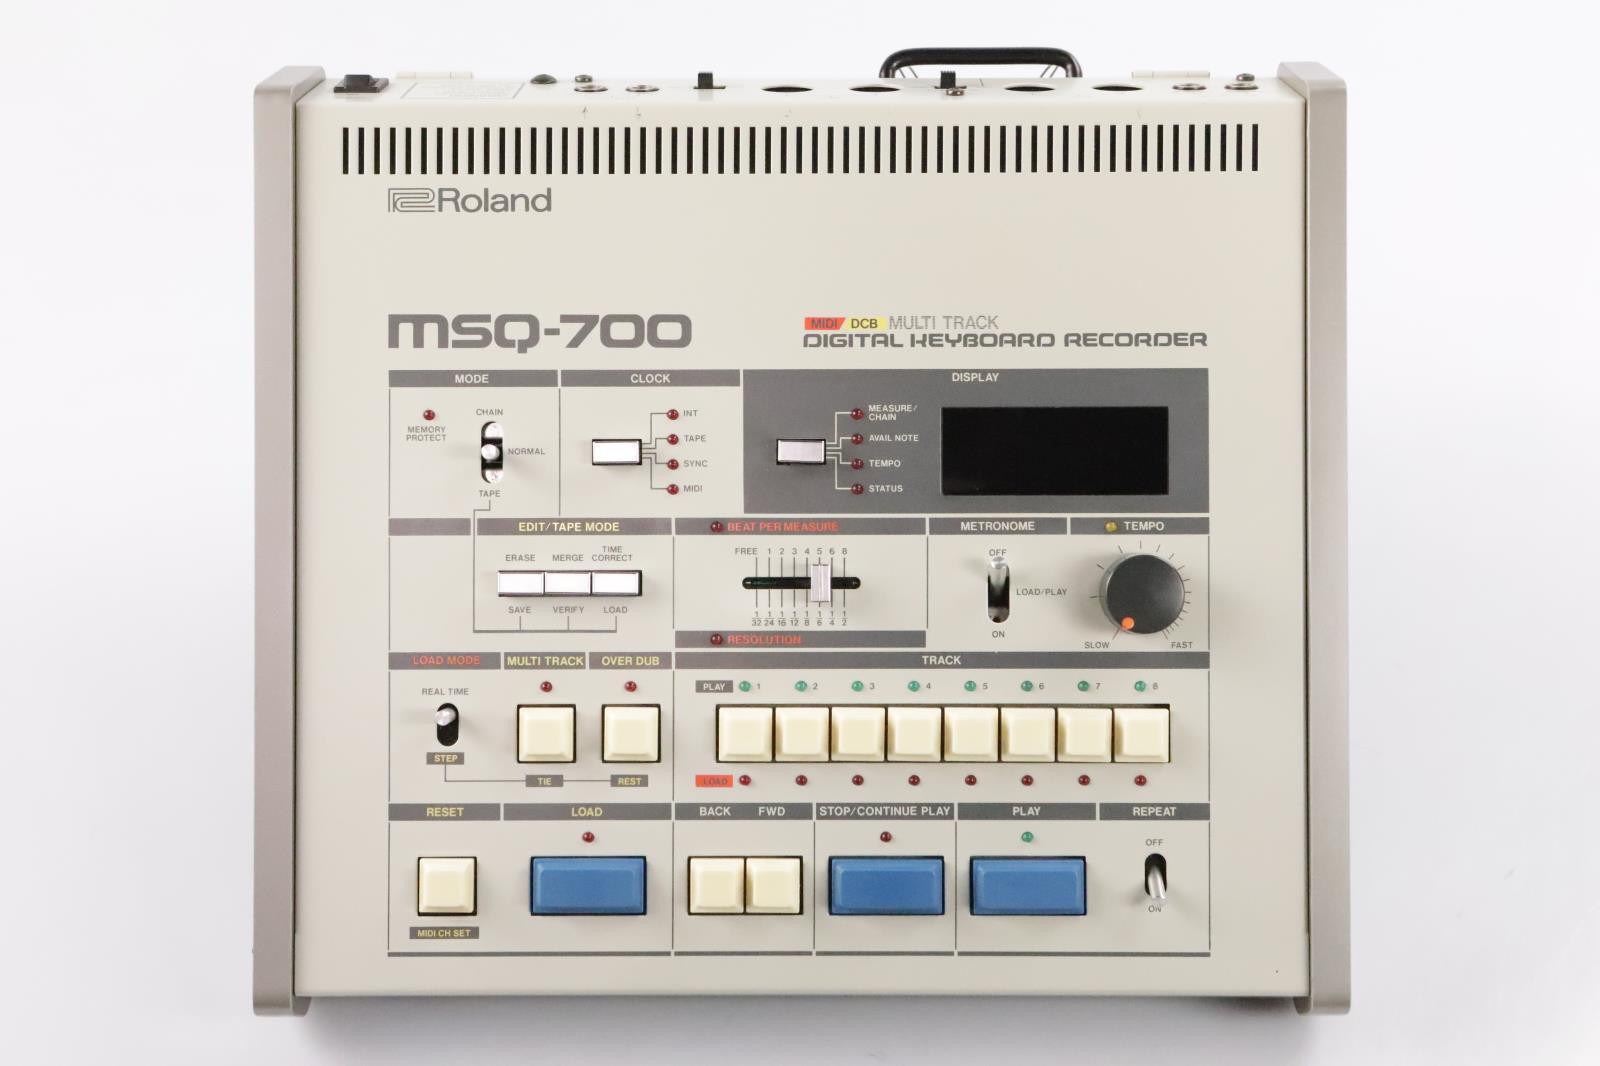 Roland MSQ-700 Vintage Digital Keyboard Recorder MIDI DCB  #34287